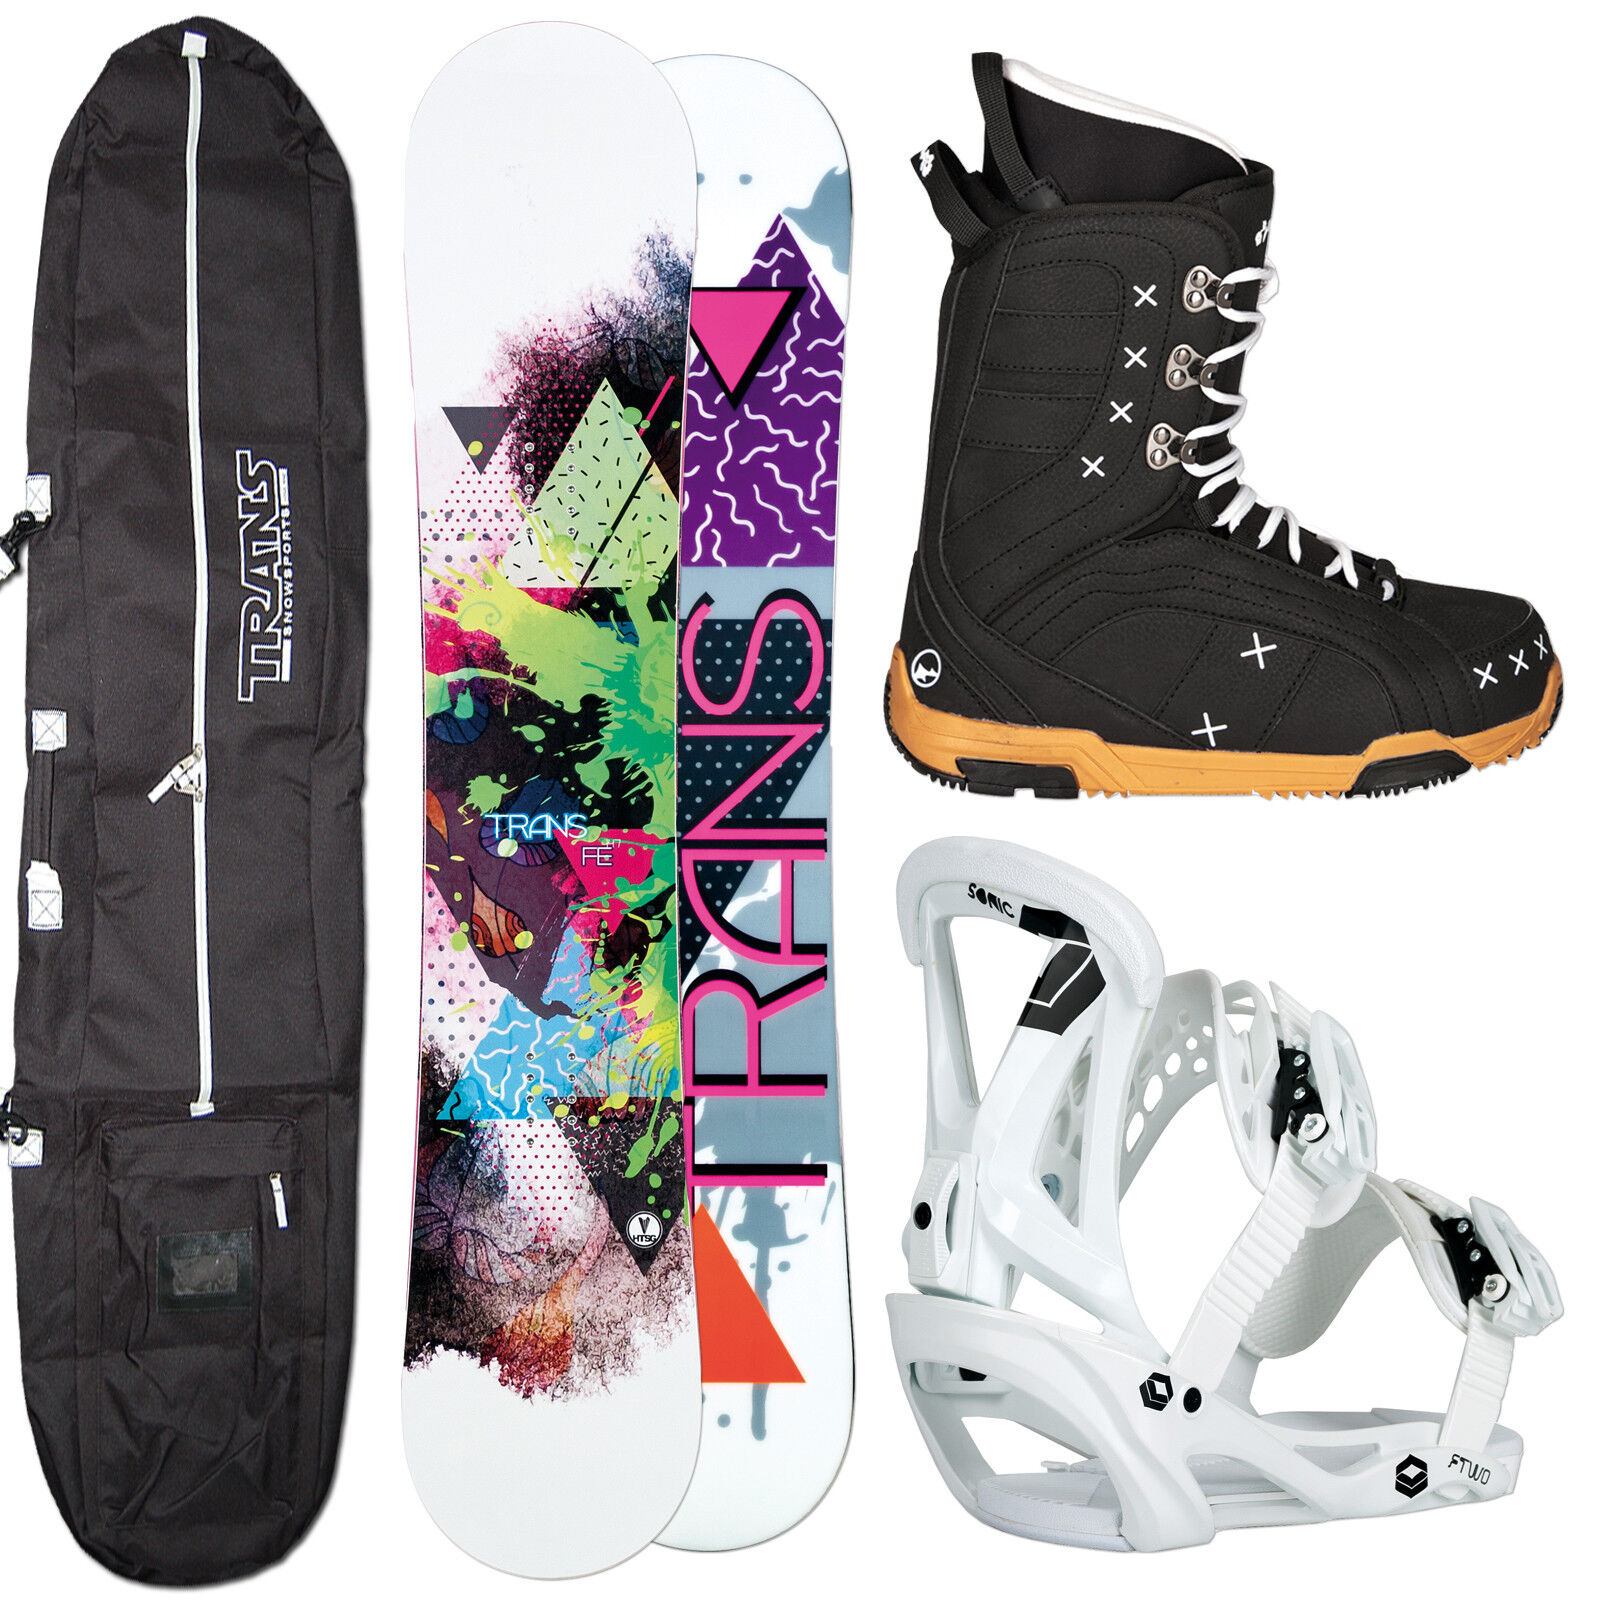 Women's Snowboard Set Trans Fe 150 cm + Ftwo Sonic Binding SIZE M + Boots+ Bag